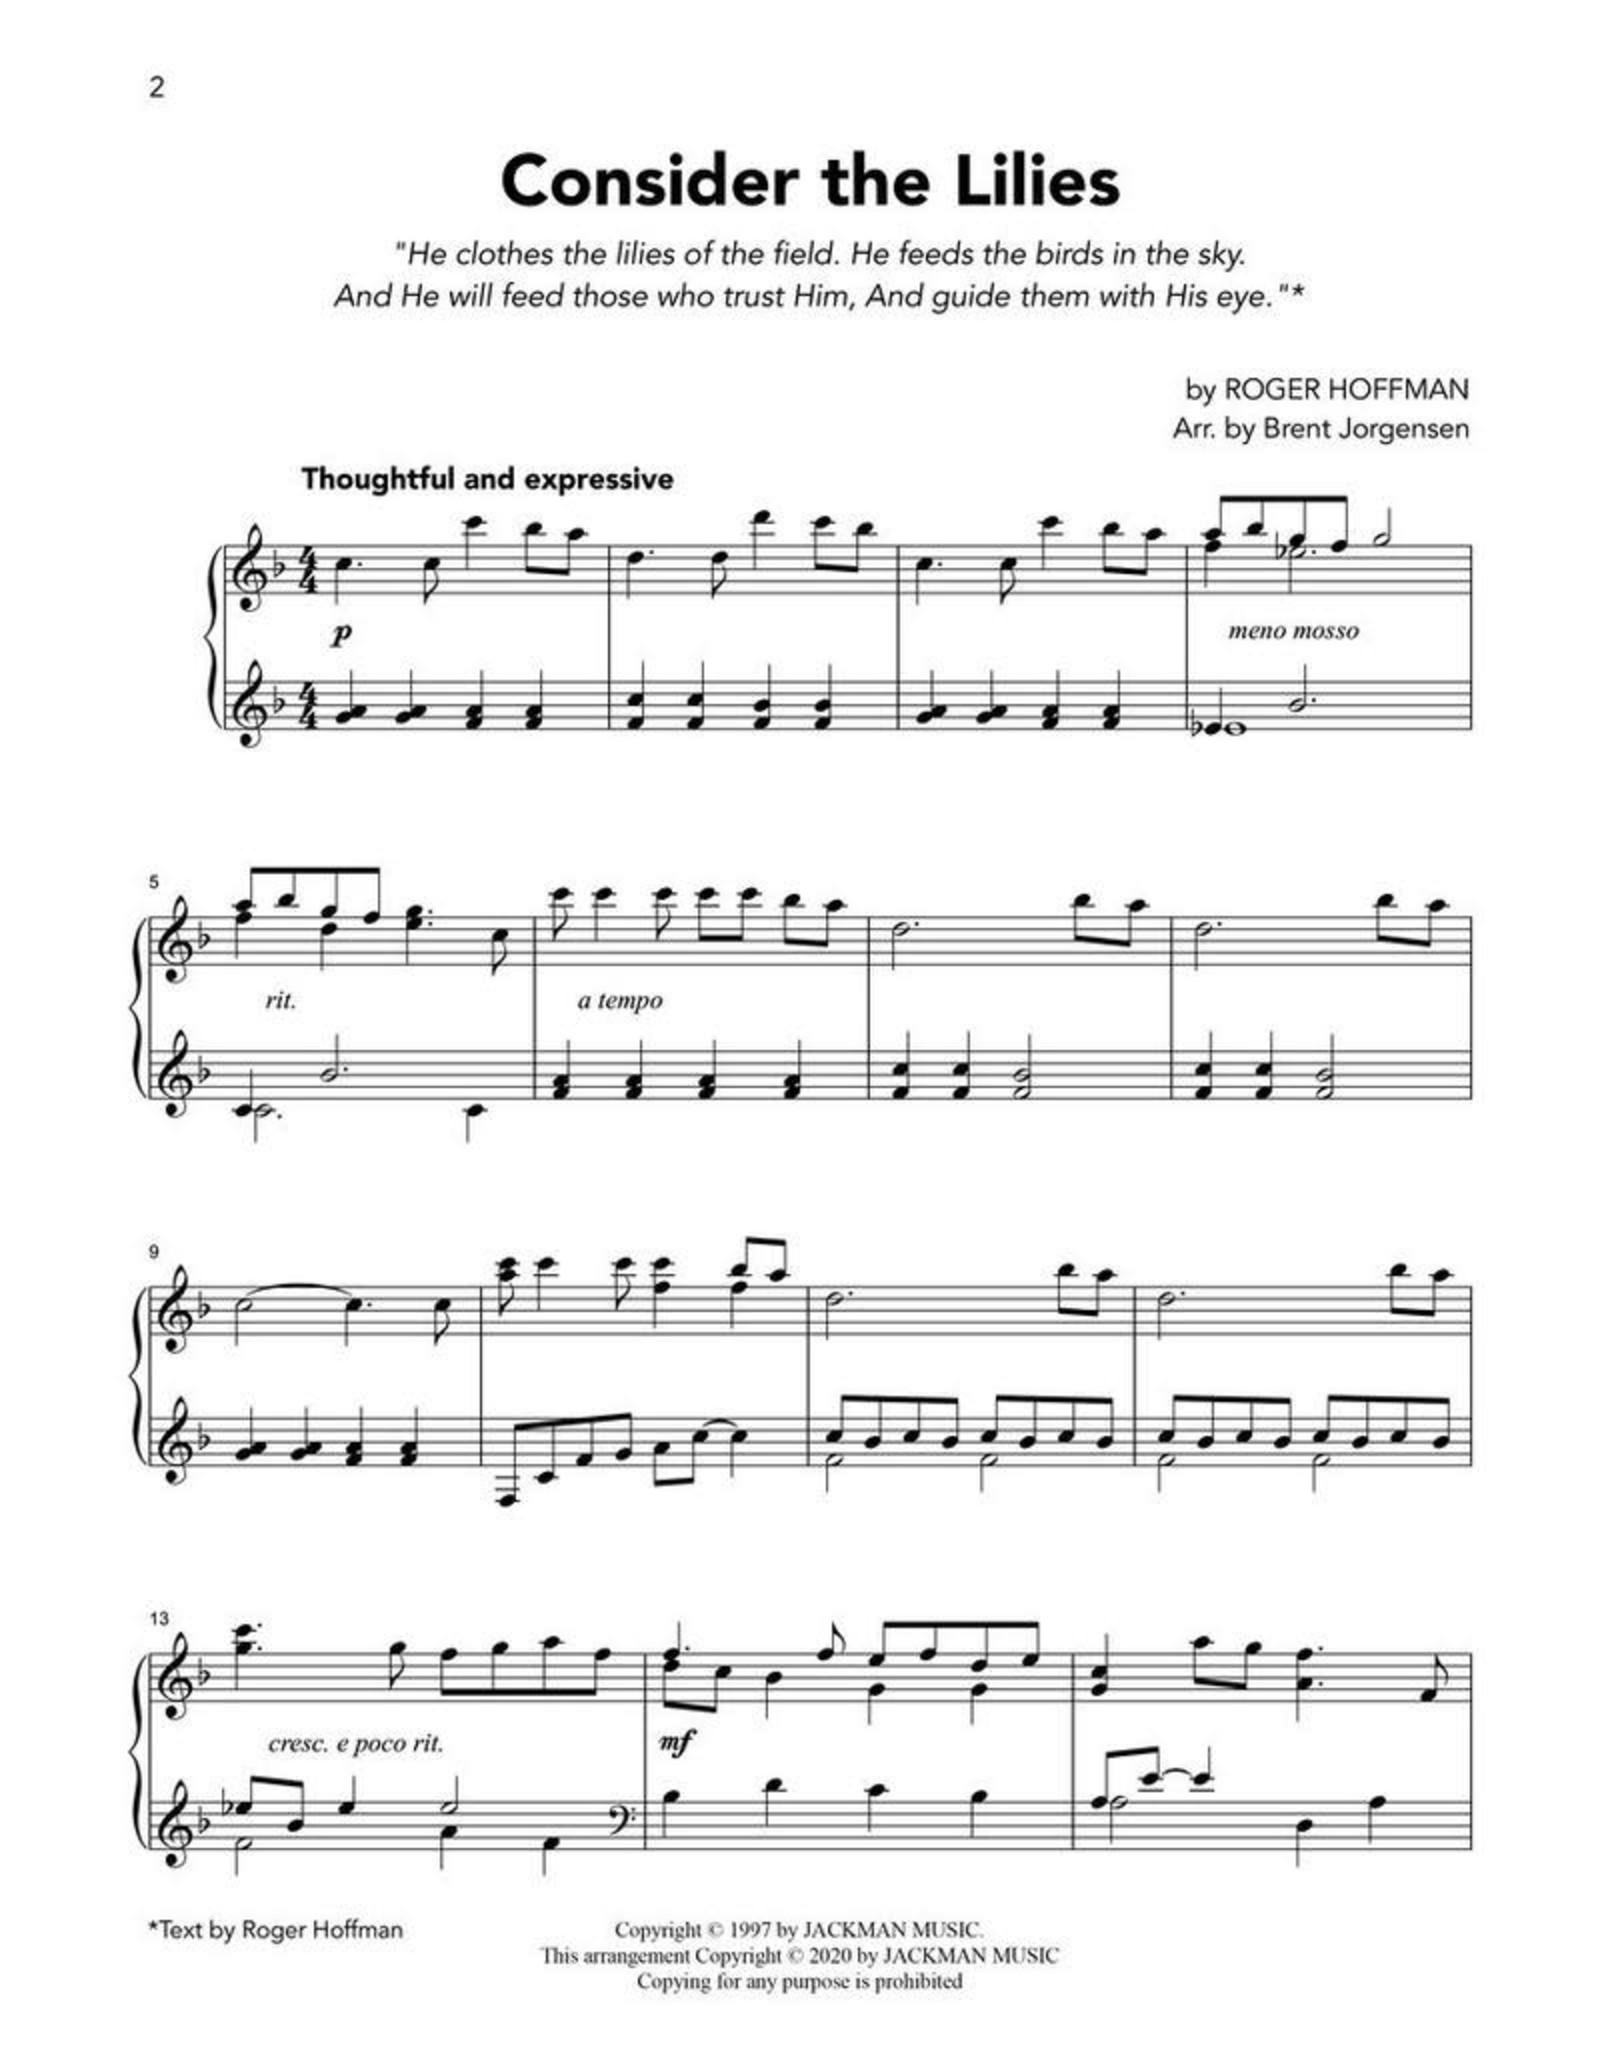 Jackman Music Latter-day Saint Piano Solos Vol. 1 arr. Brent Jorgensen